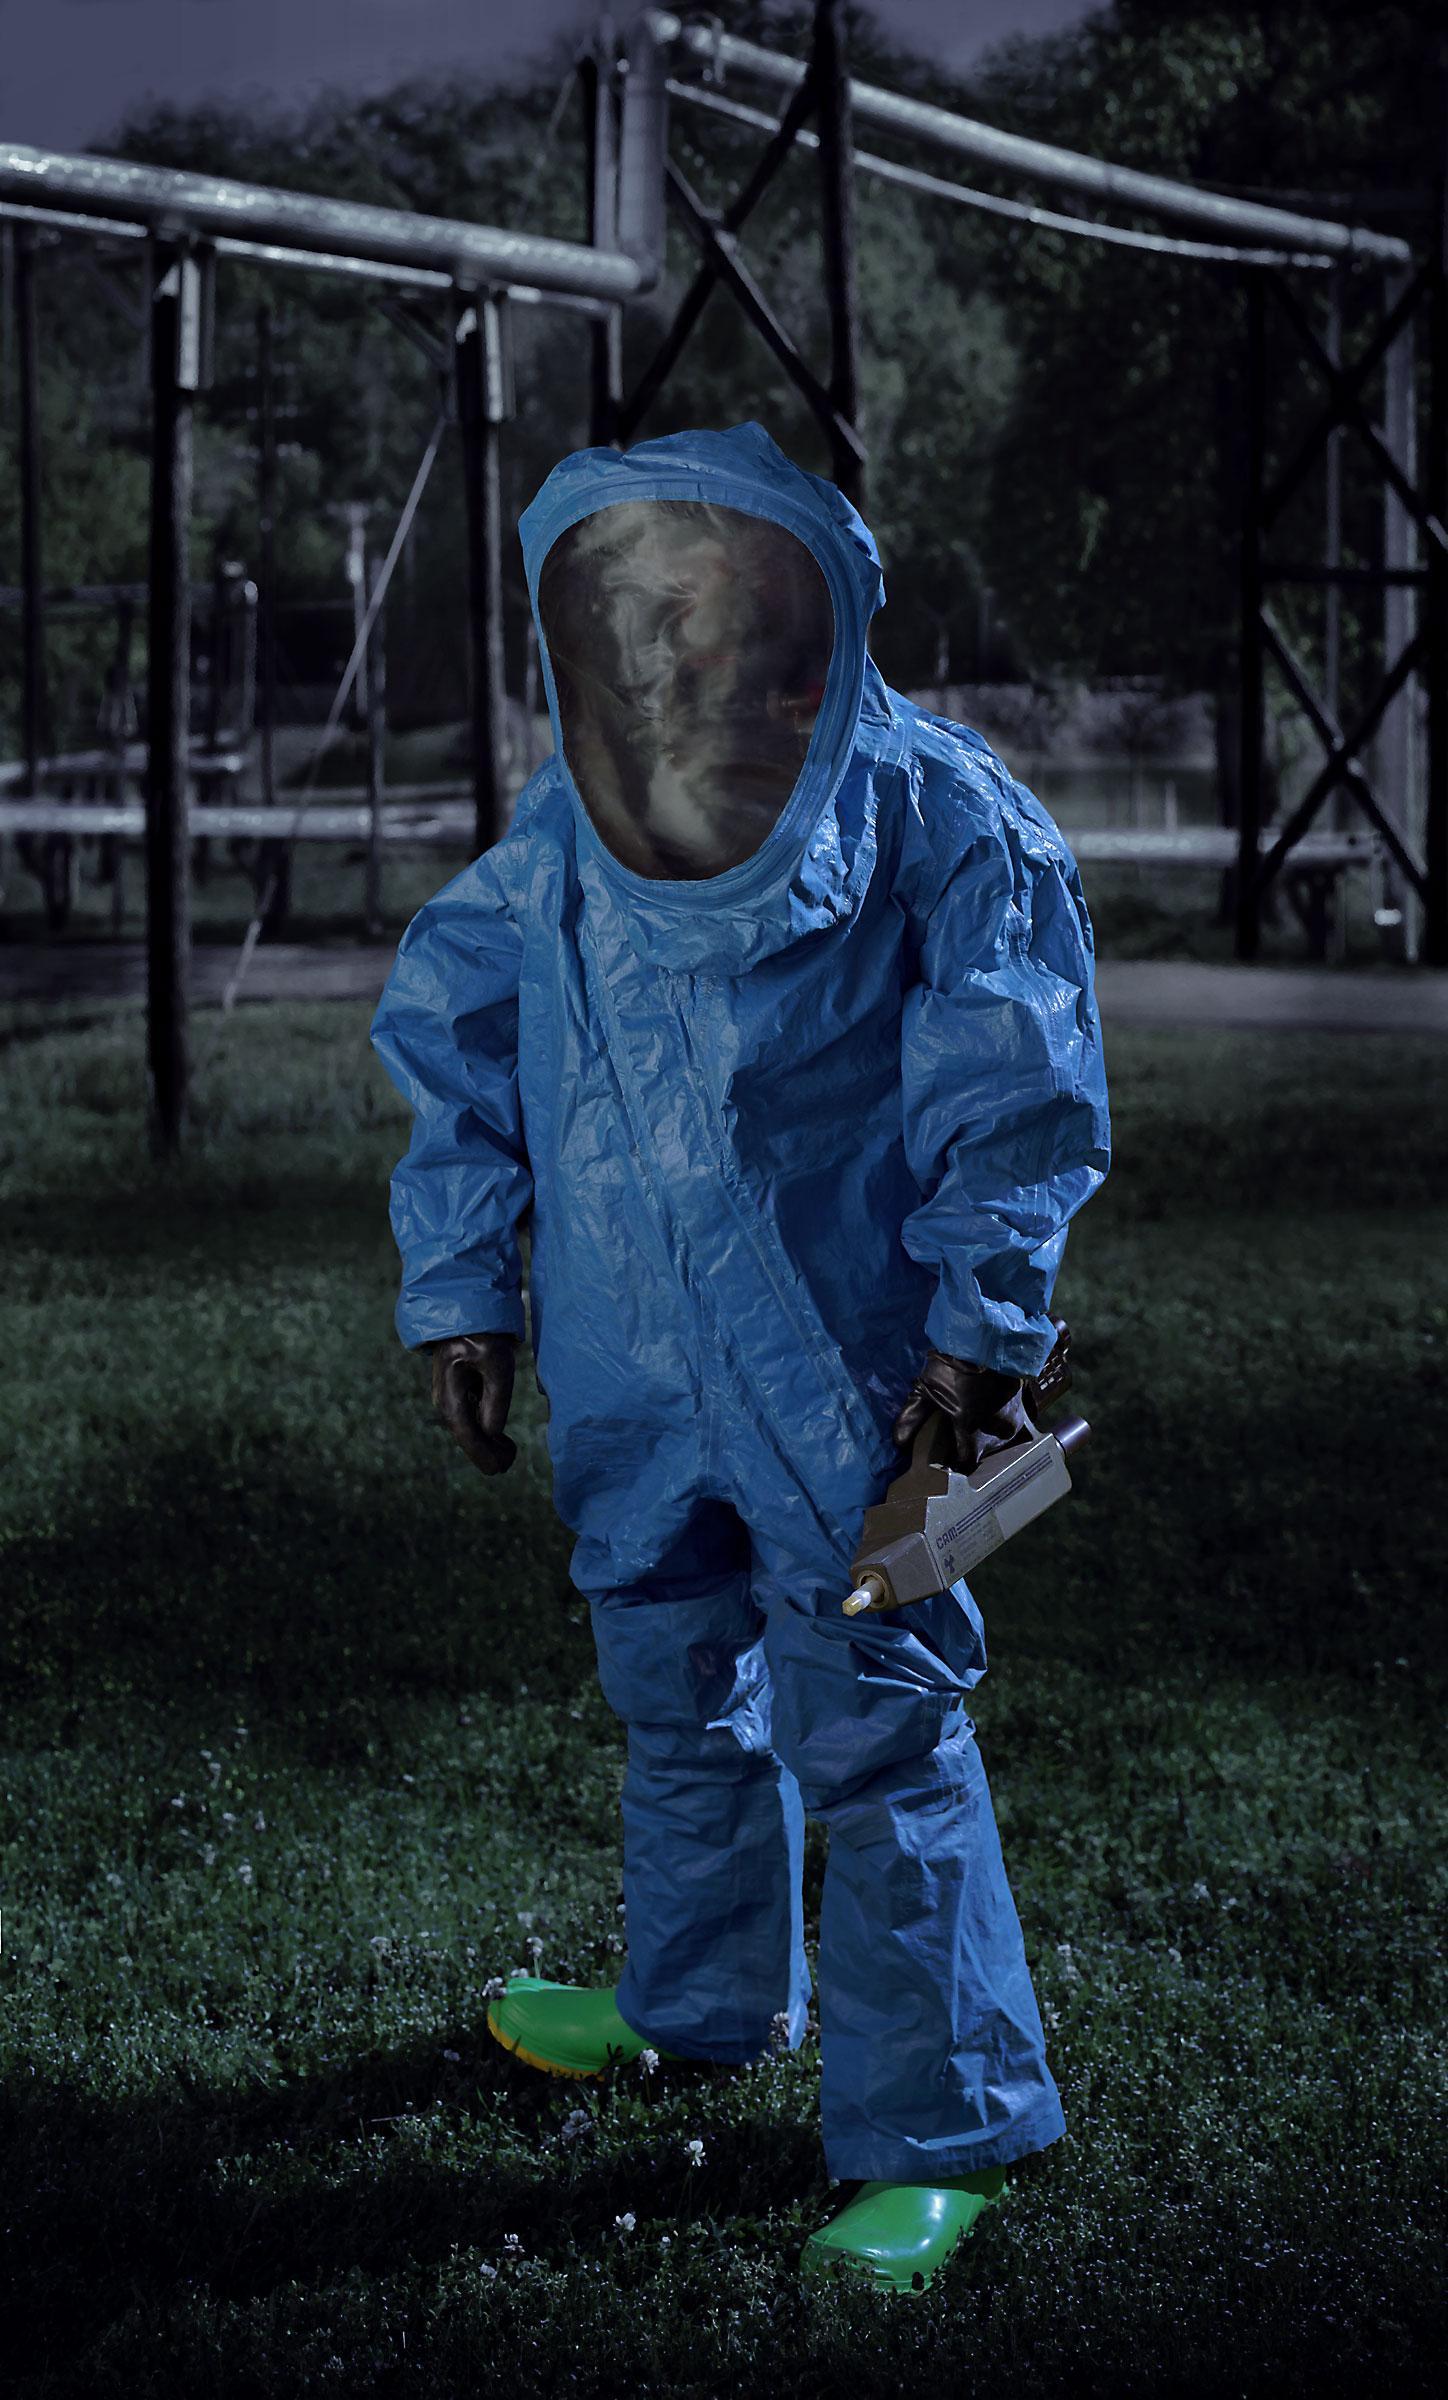 Level A HAZMAT suit, blue. (Ordnance Munitions and Electronic Maintenance School, U.S. Army, Redstone Arsenal, Huntsville, AL) 2007.